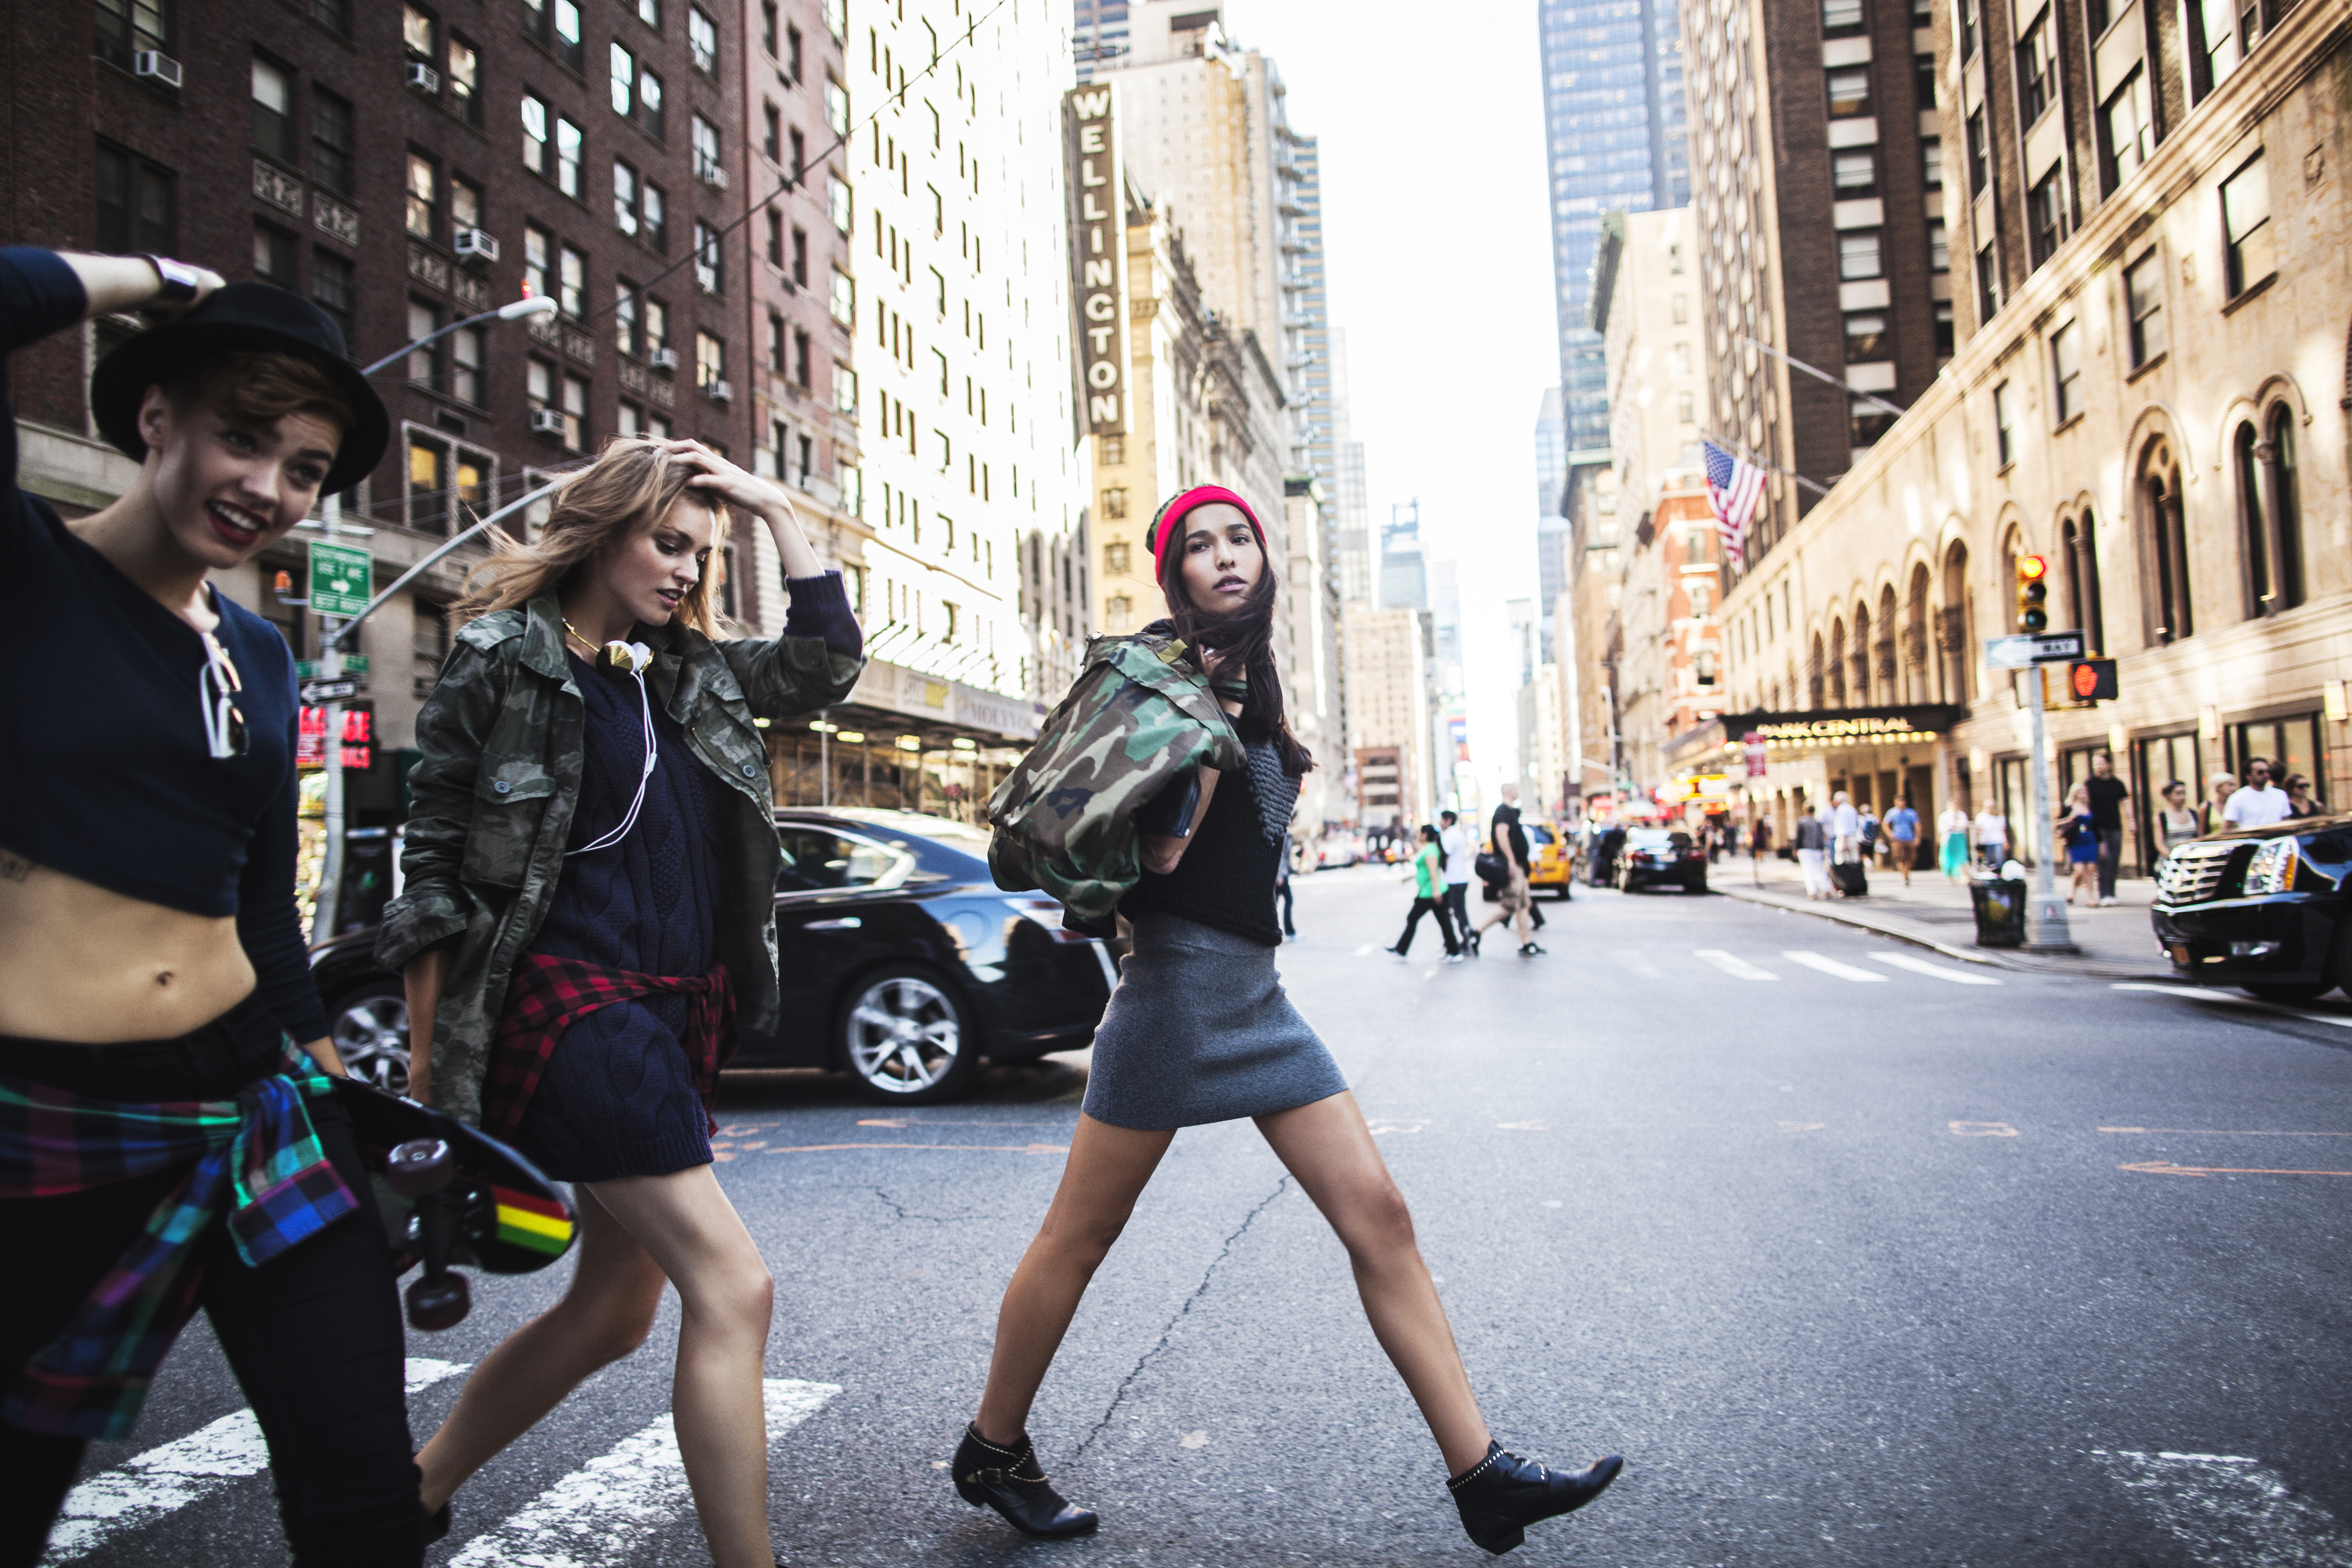 Urban Street Fashion Pictures Scarlett Johansson Zimbio   5616x3744